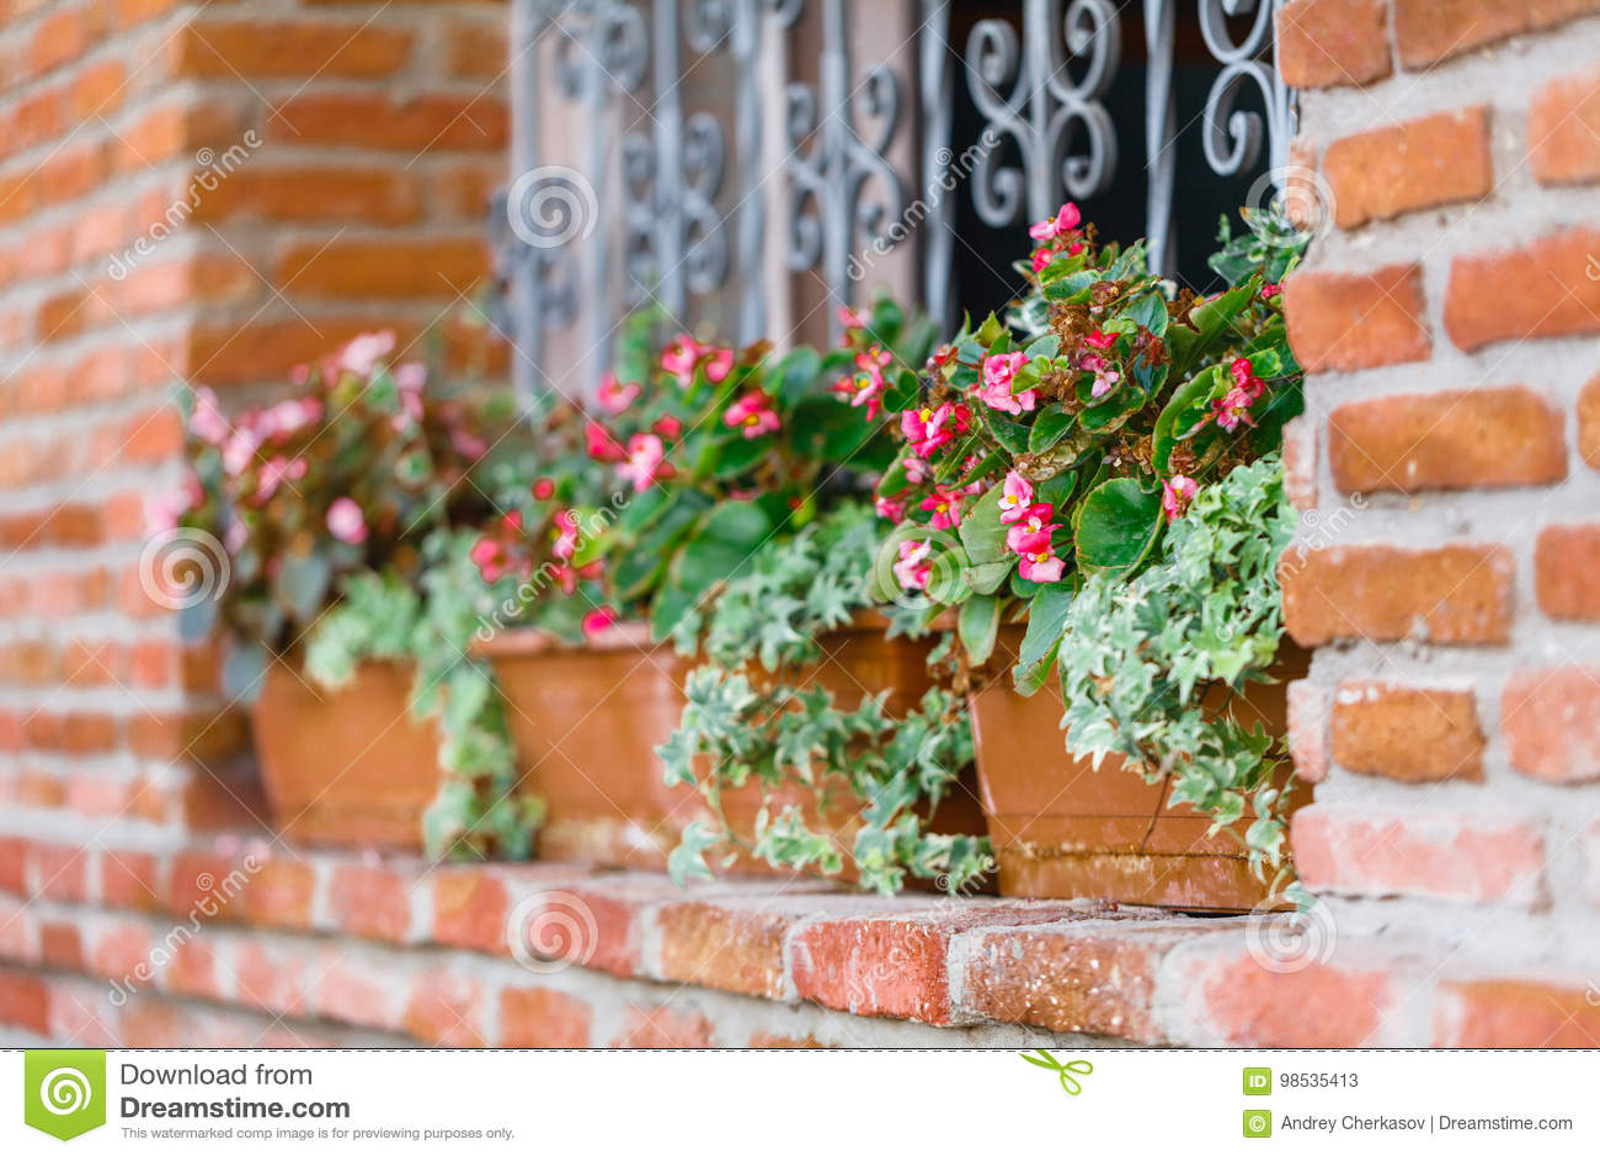 Beautiful Flowers Growing In A Window Garden Stock Image Image Of